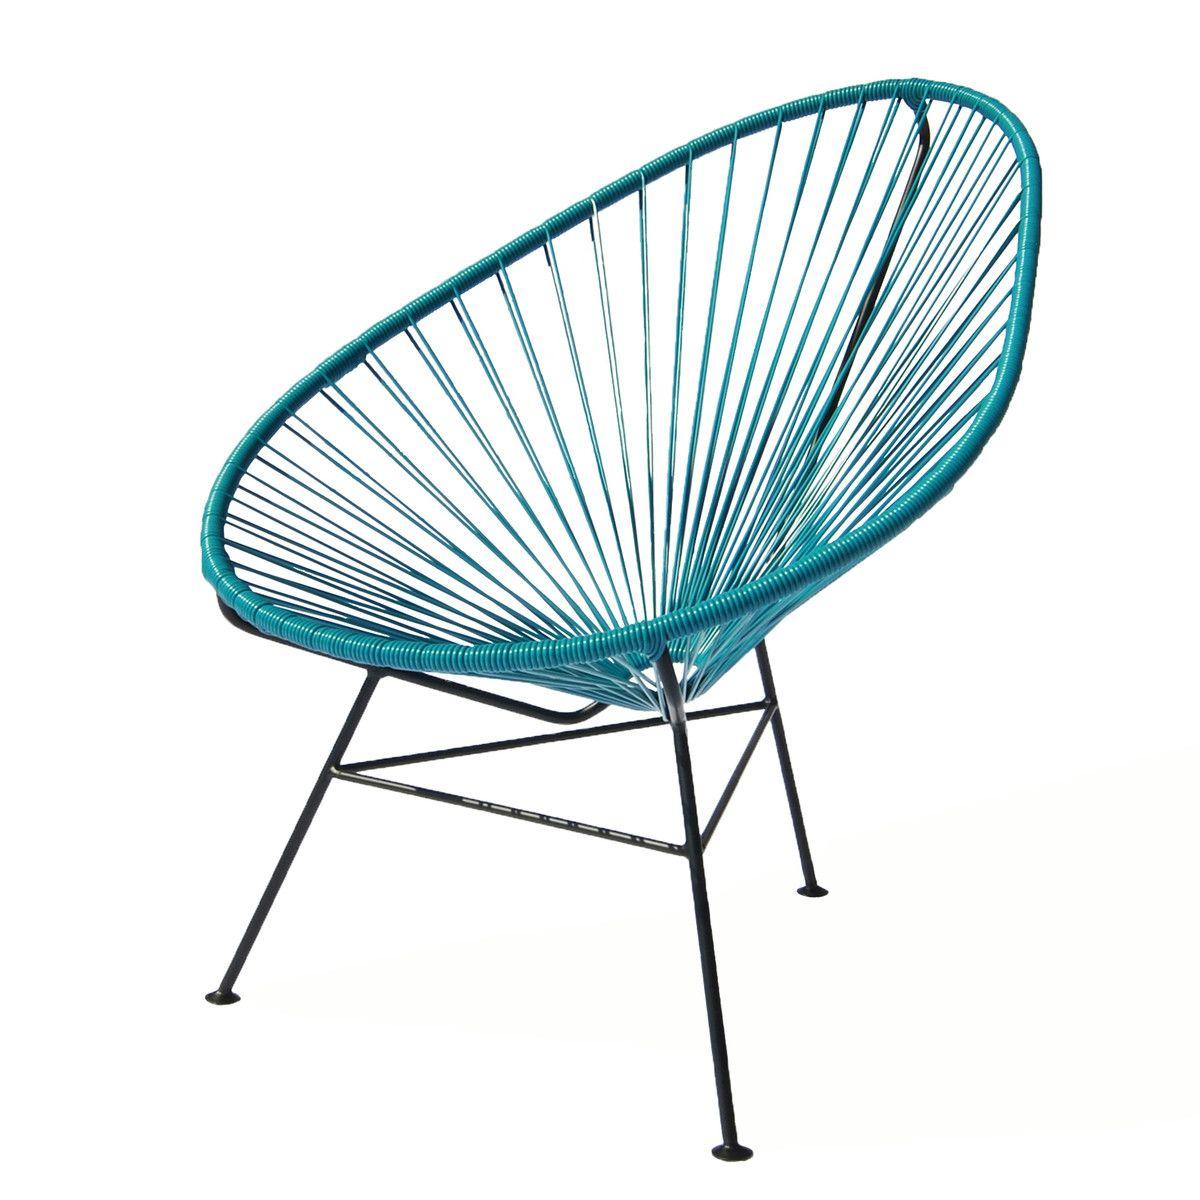 ok design the acapulco chair schwarz haus acapulco sessel und st hle. Black Bedroom Furniture Sets. Home Design Ideas